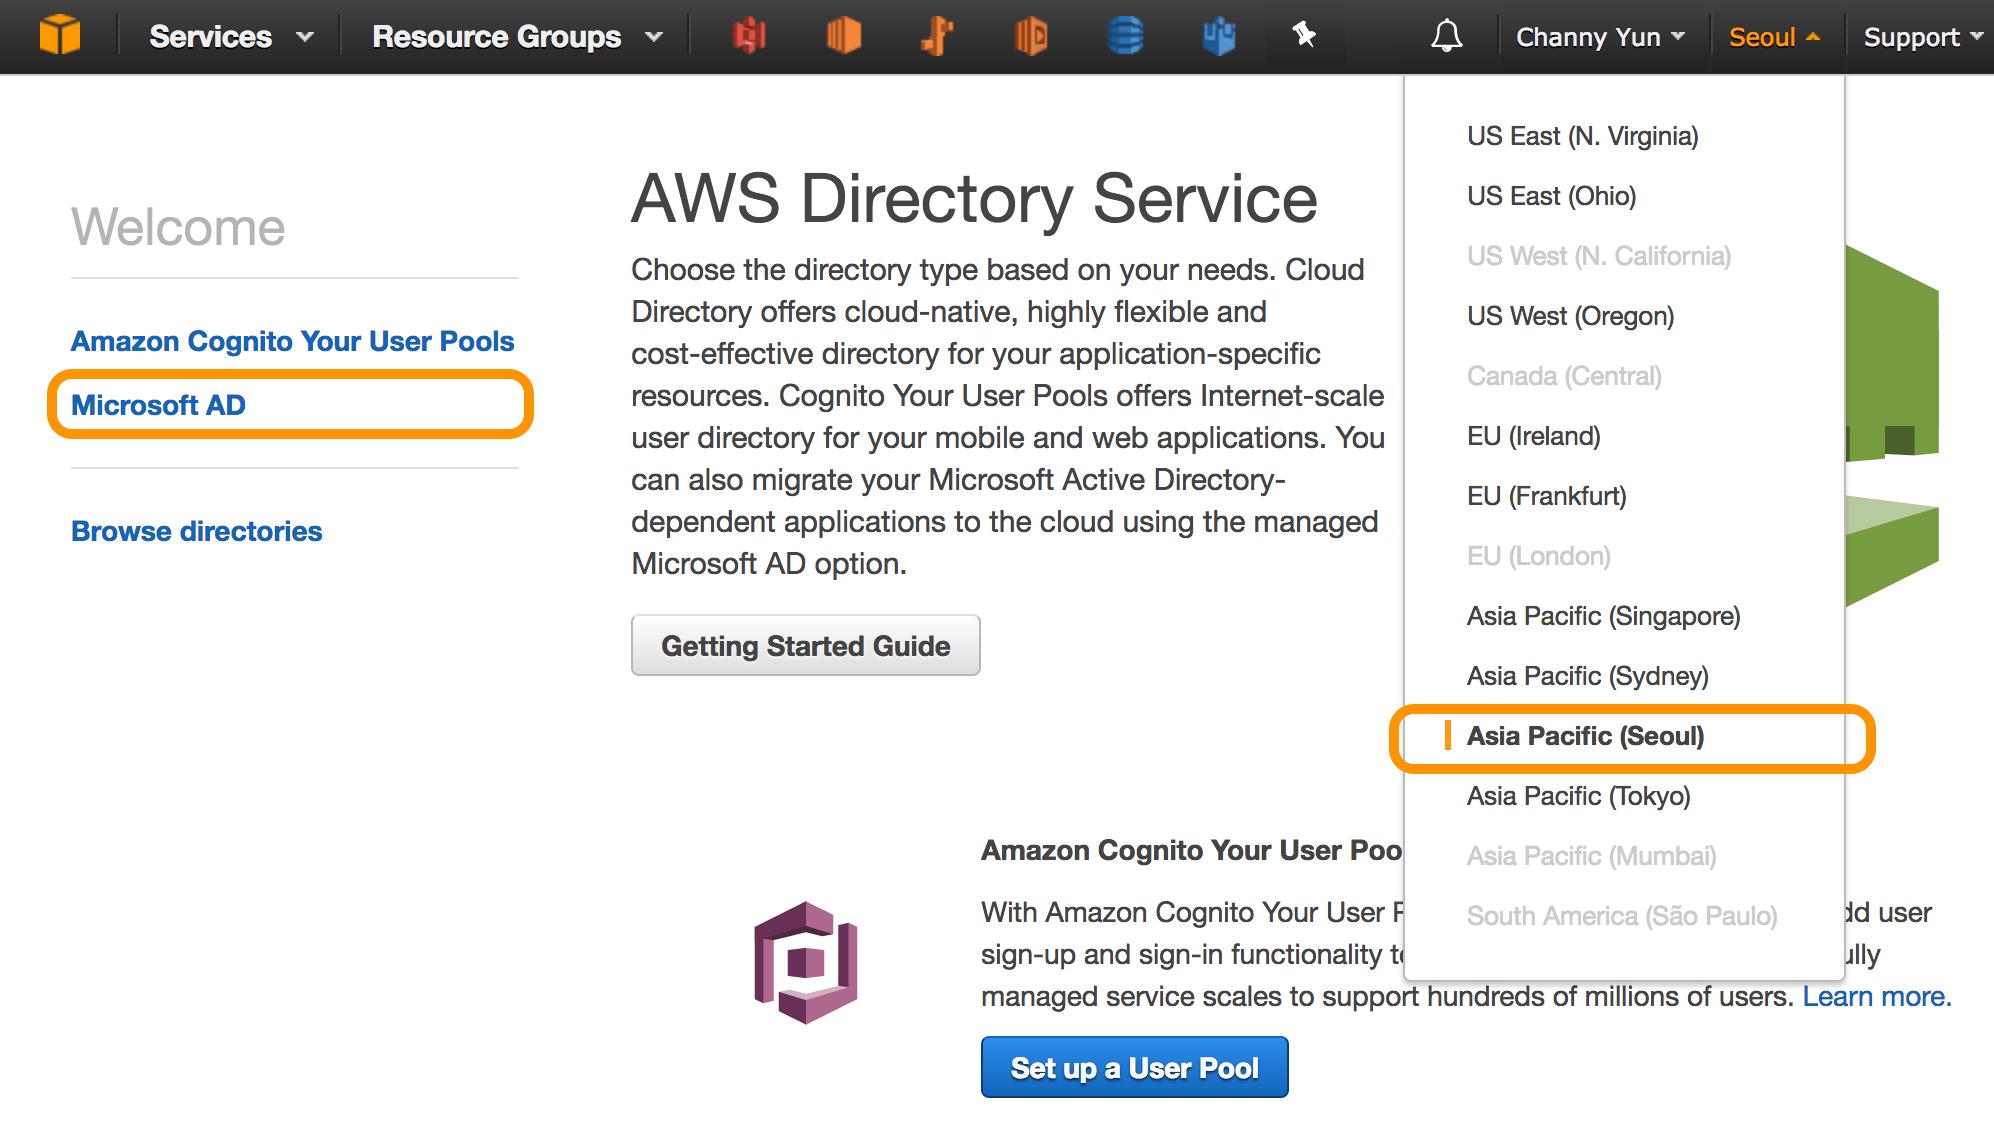 aws-directory-service-microsoft-ad-seoul